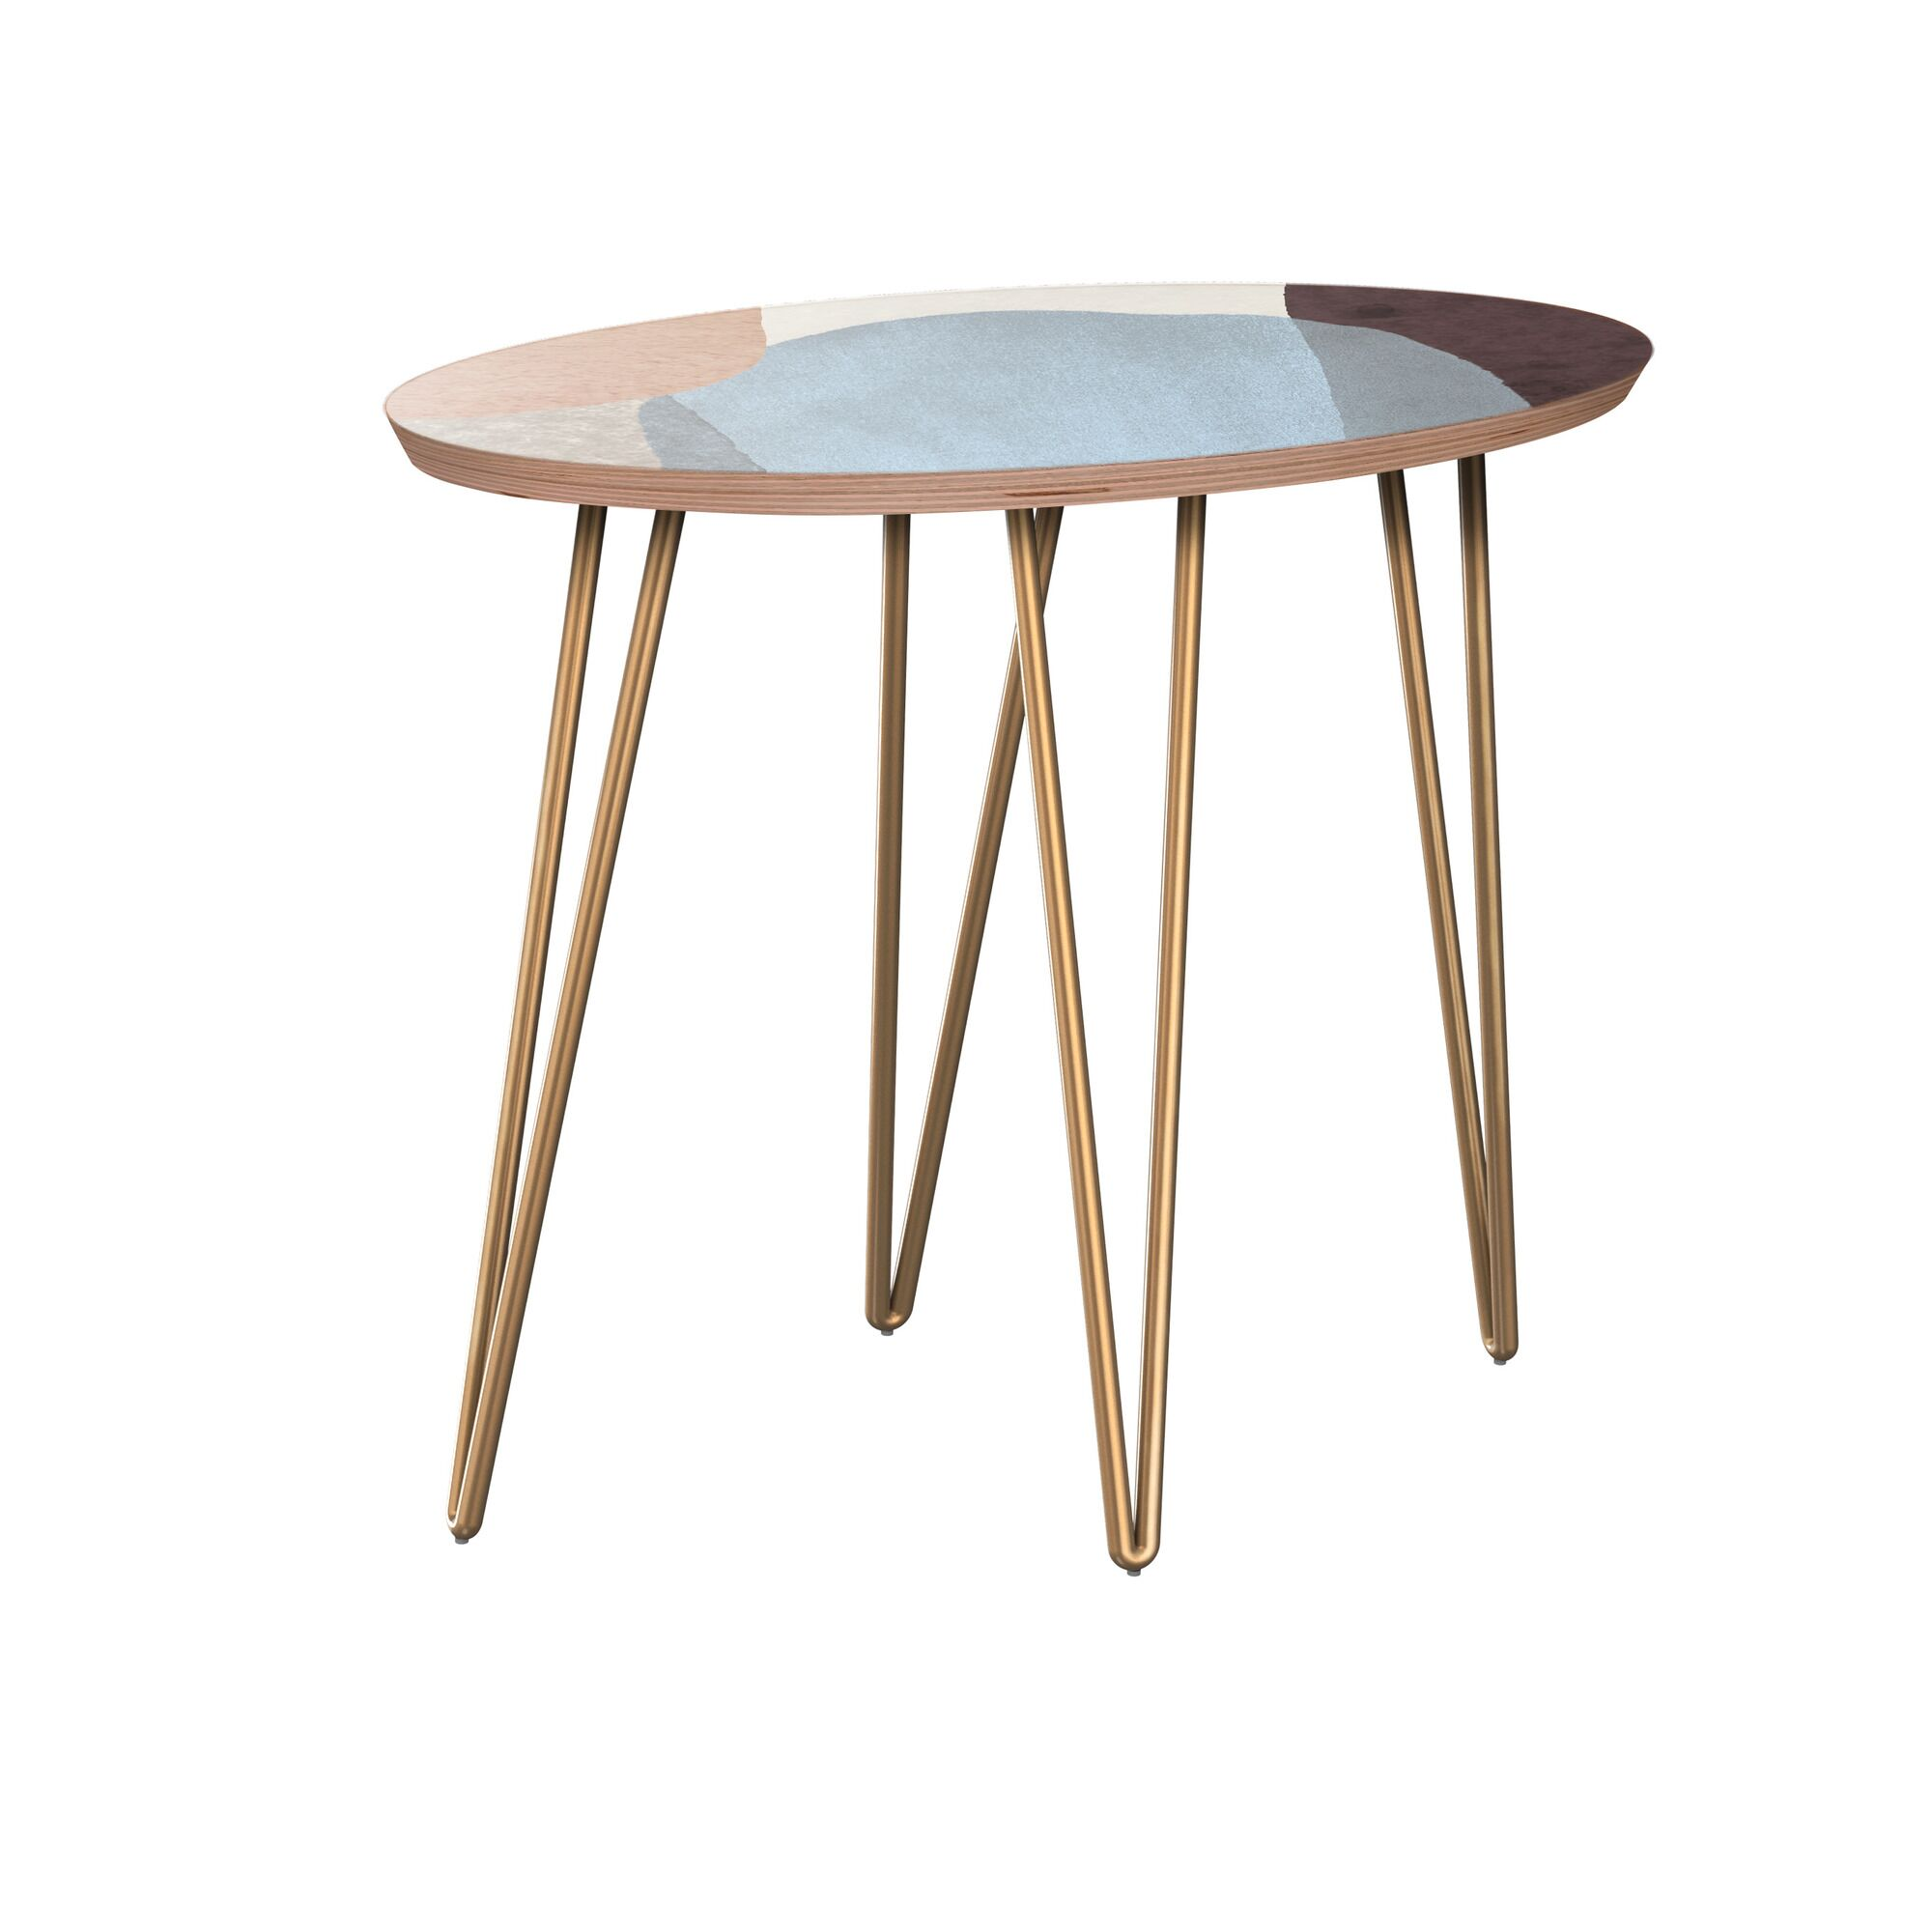 Kalyssa End Table Table Base Color: Brass, Table Top Color: Walnut